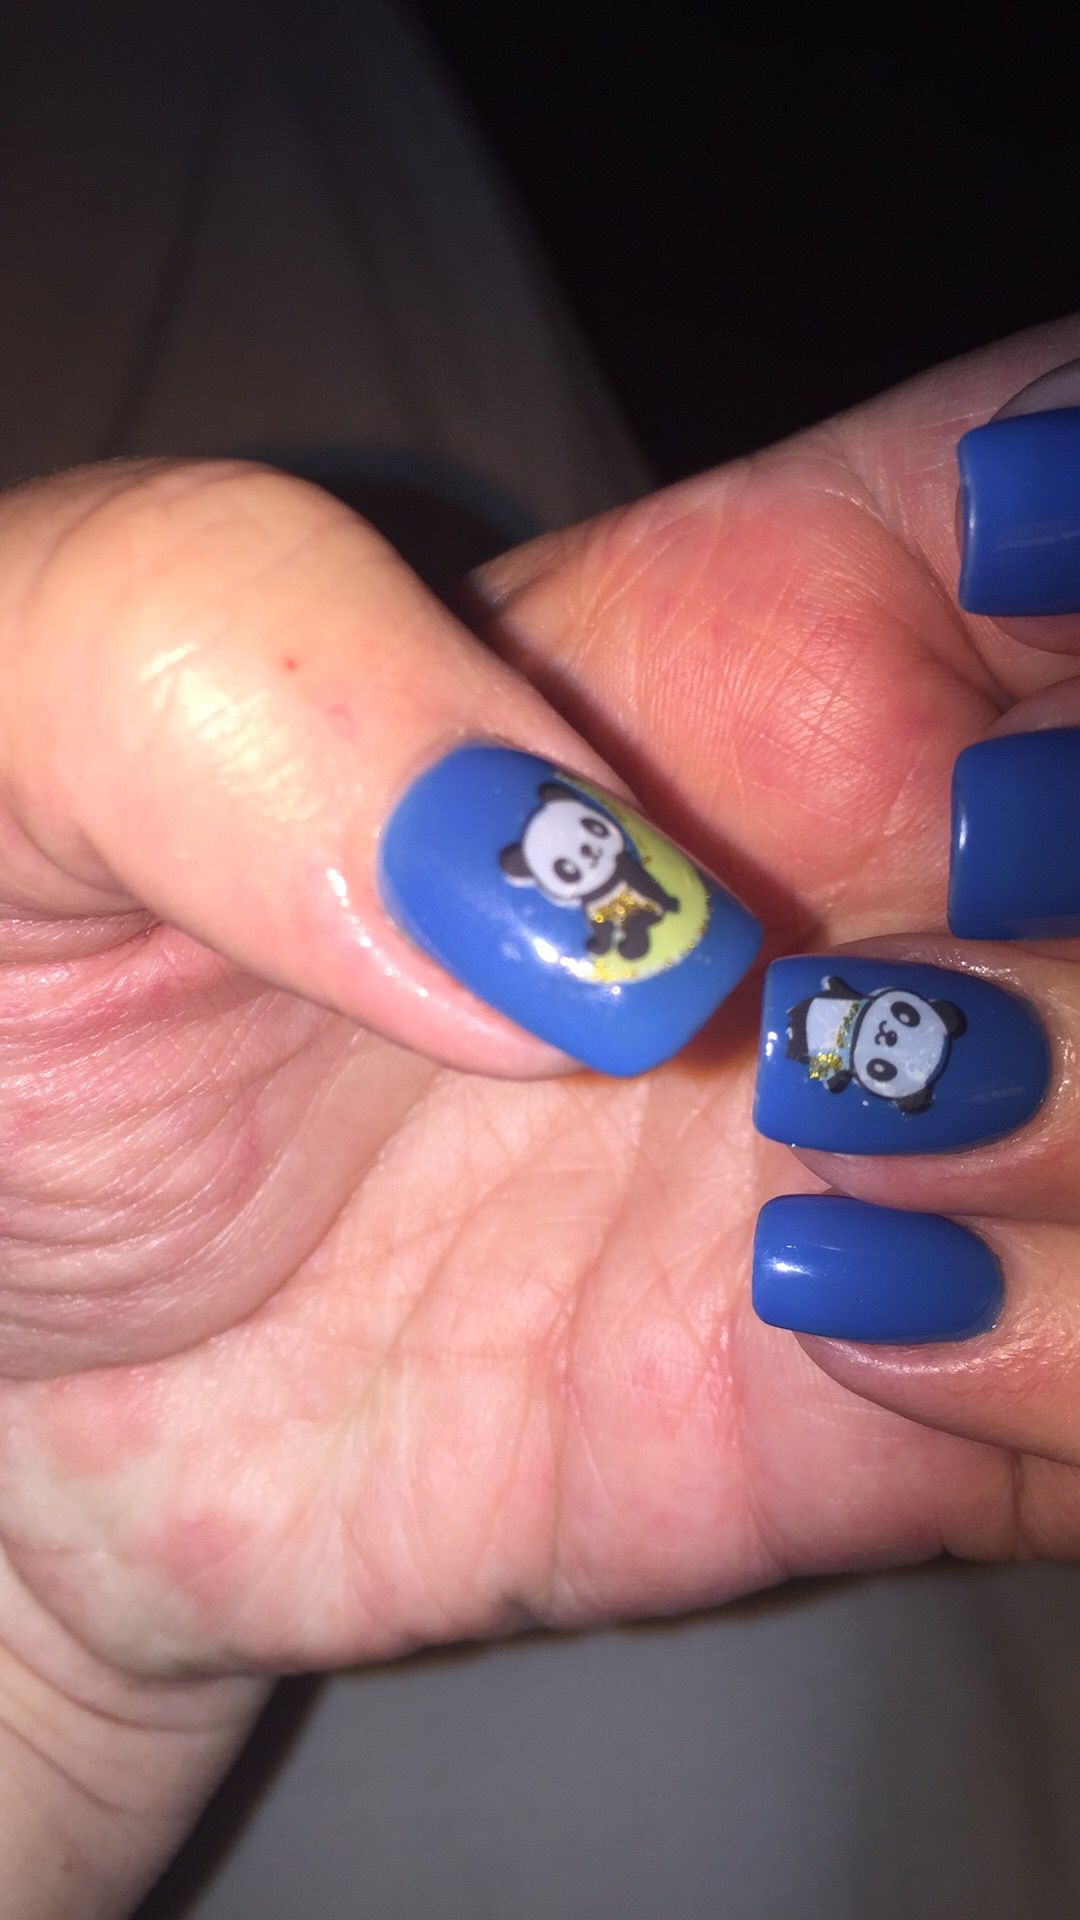 Gotta love Pandas 🐼